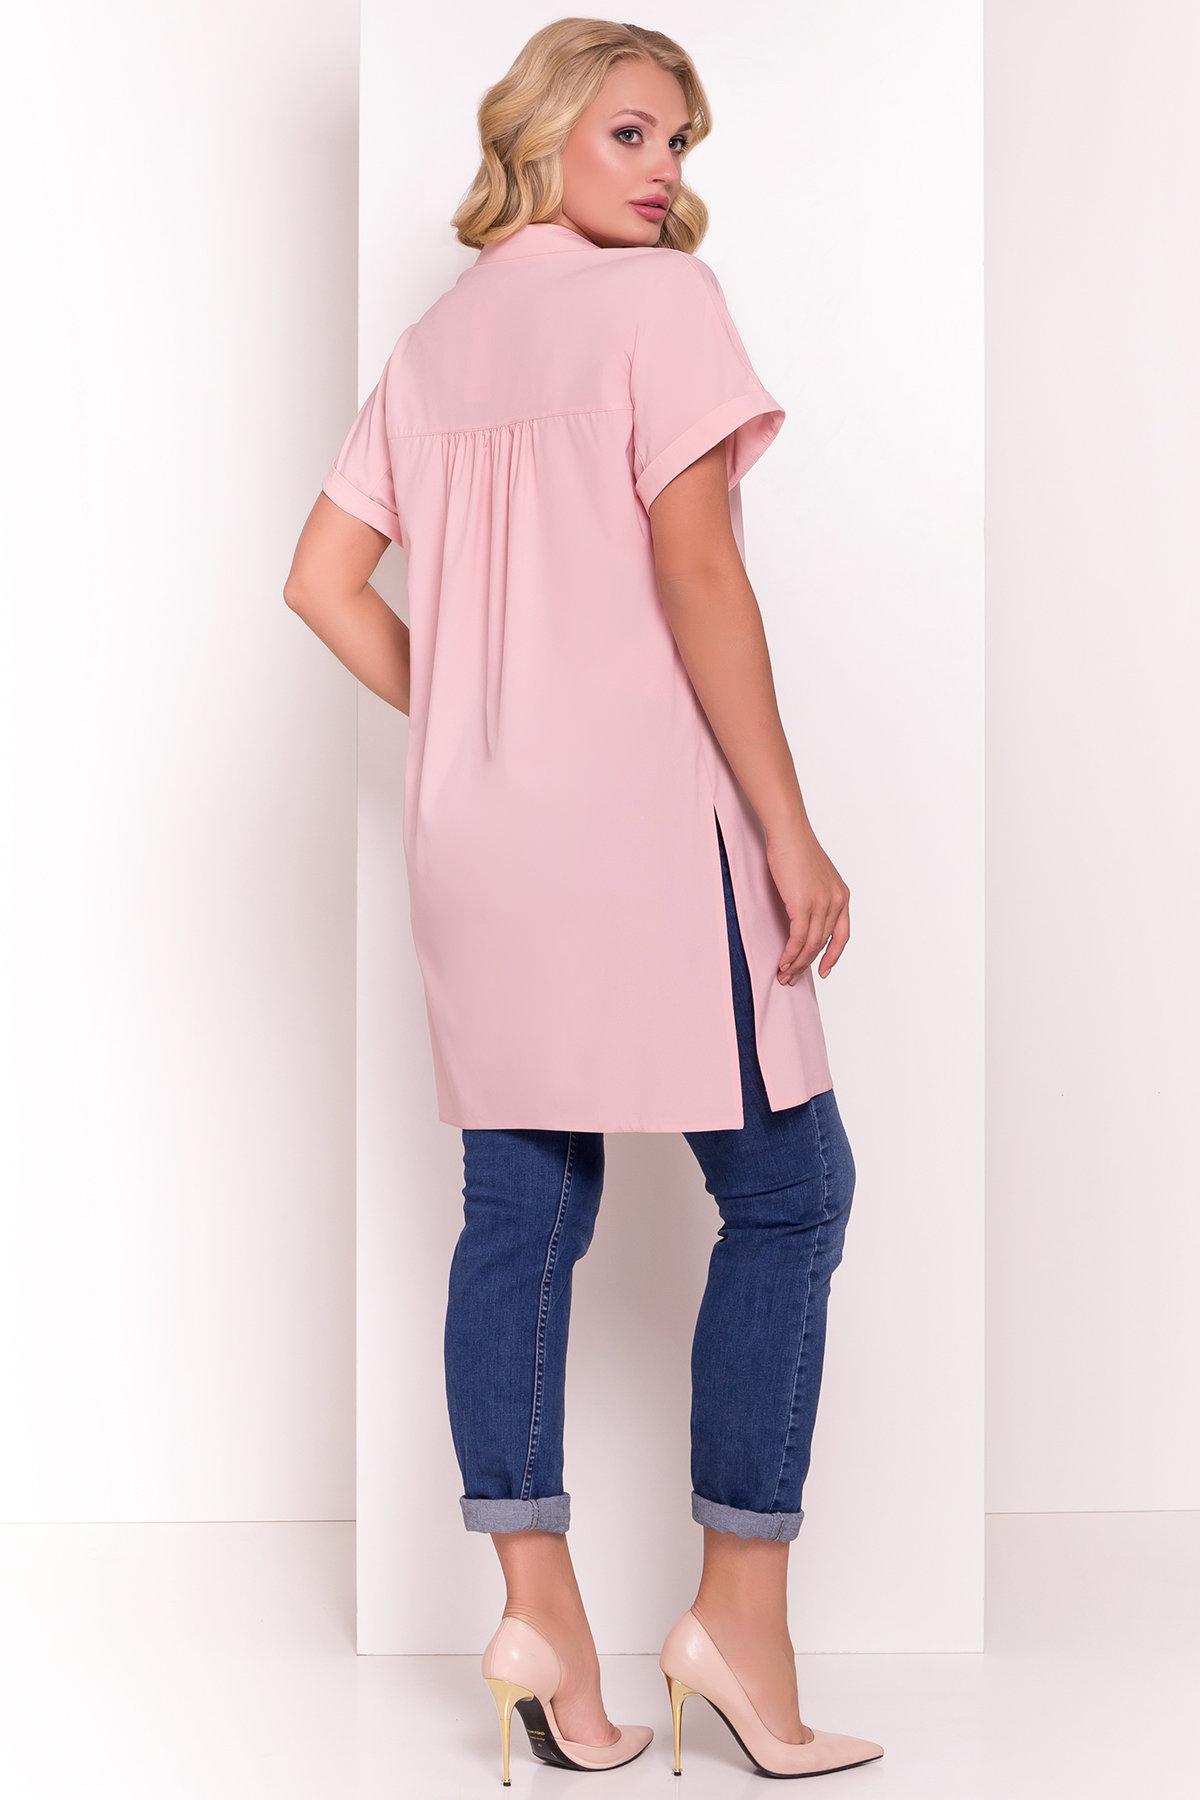 Платье-рубашка Шиен Donna 5088 Цвет: Пудра